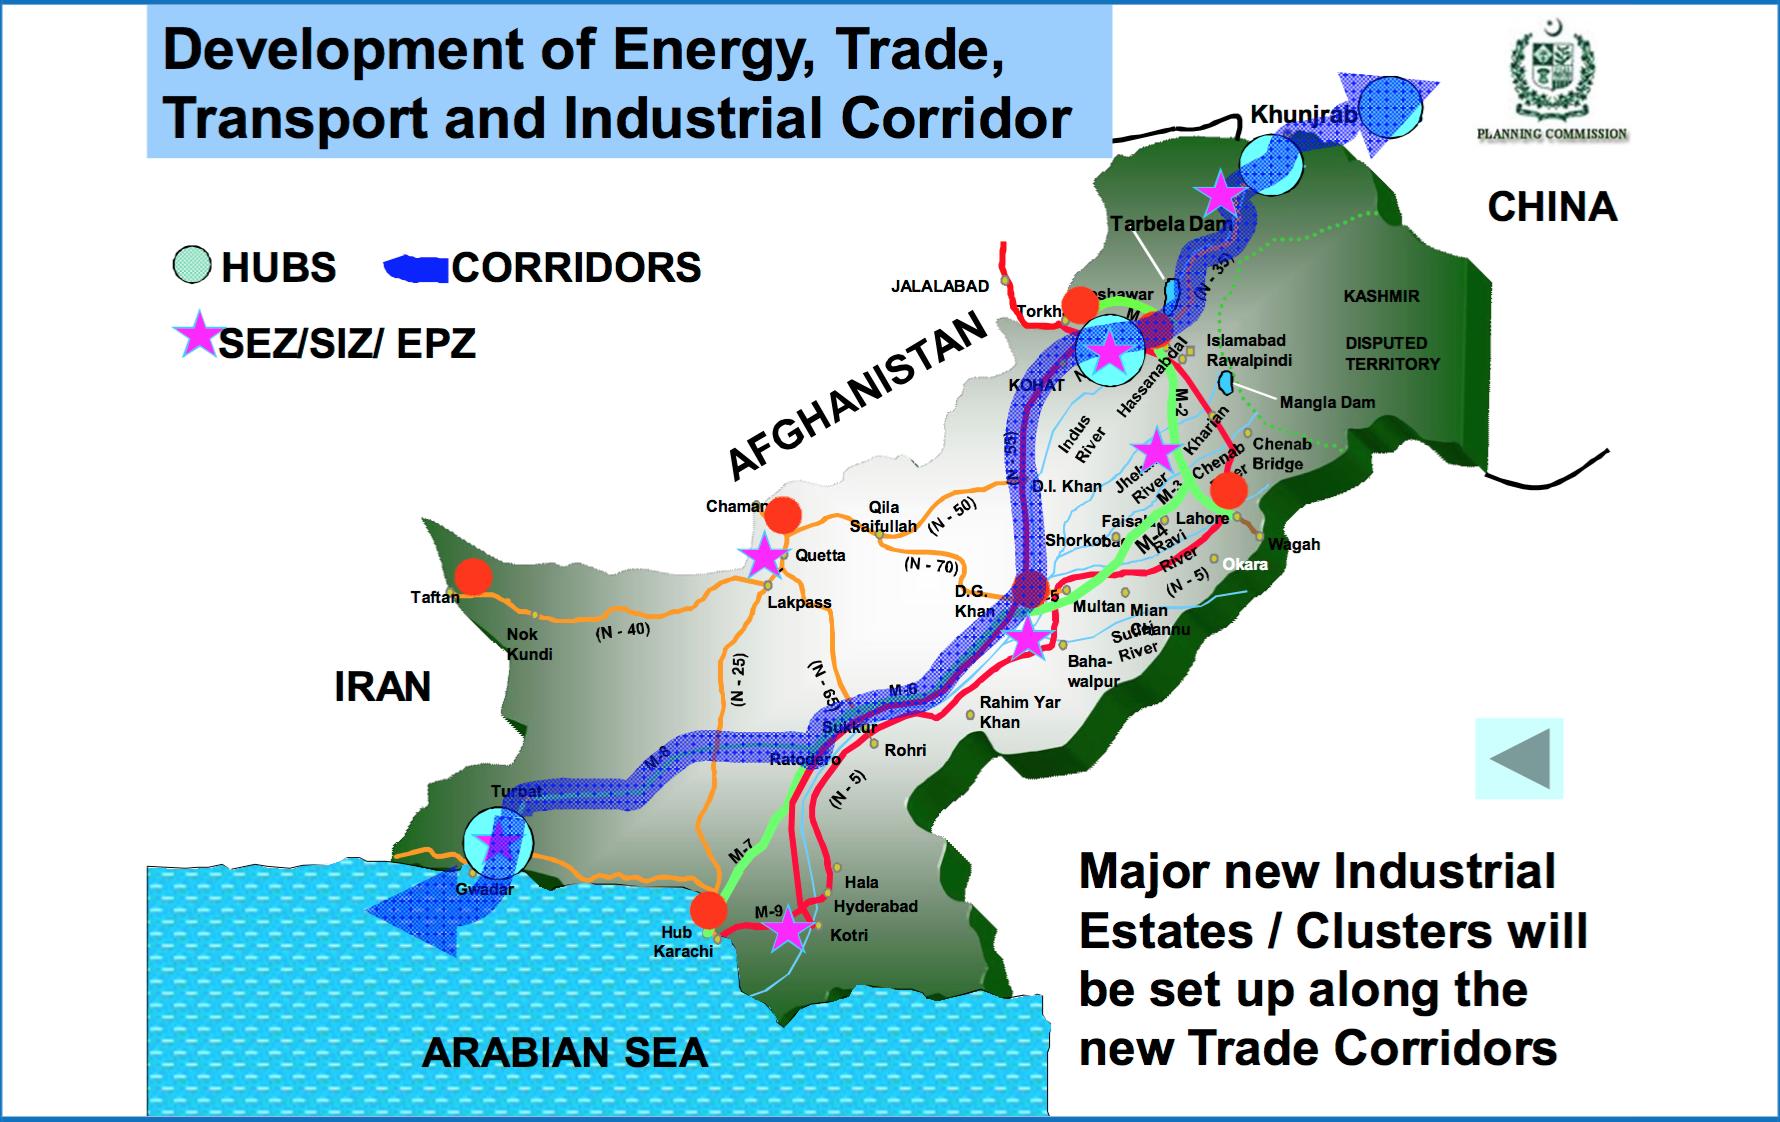 Image courtesy cmpru.gob.pk